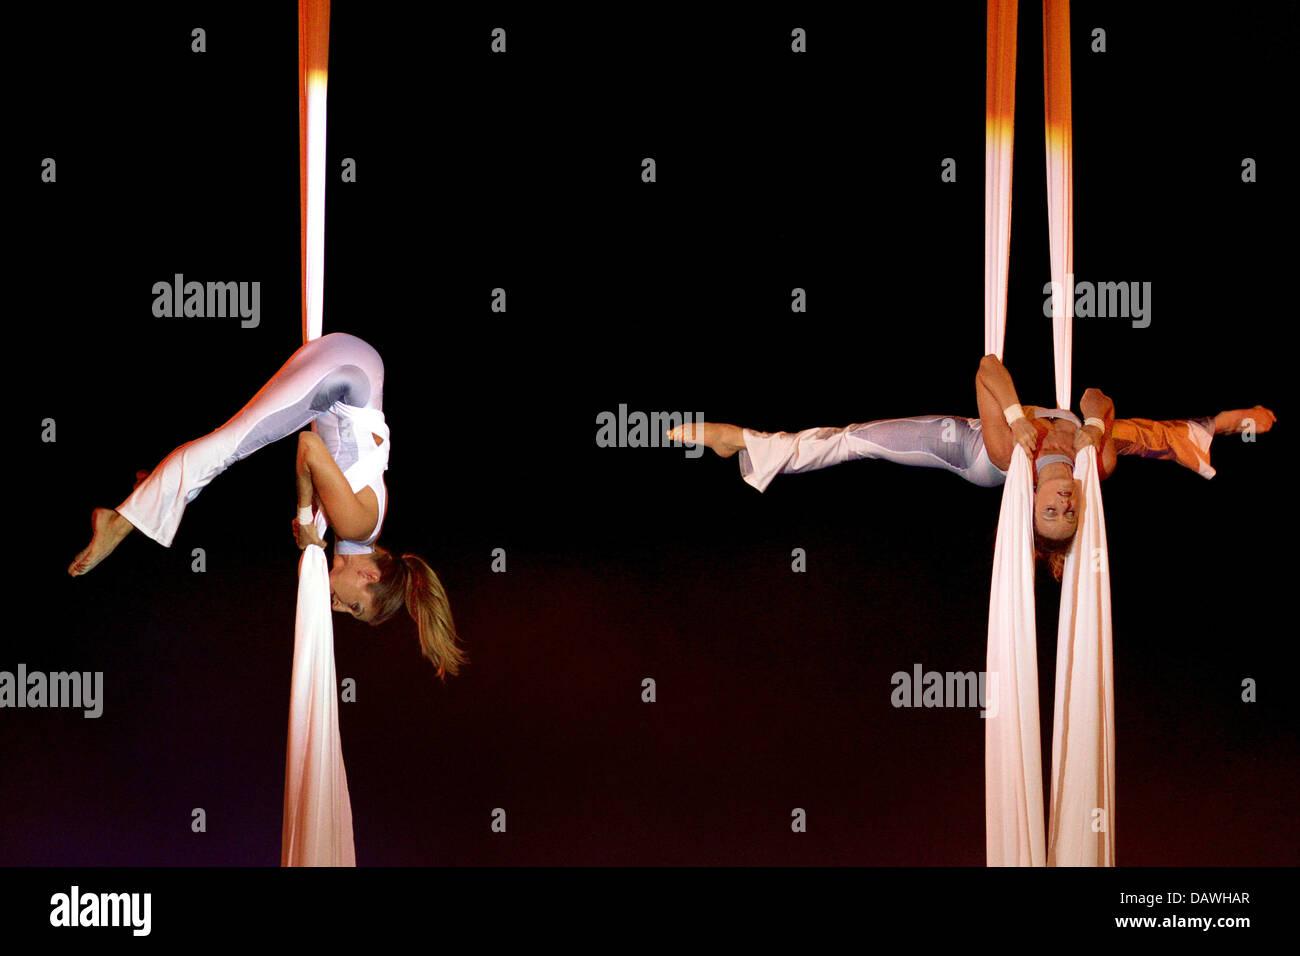 sports spo gymnastics netherlands stockfotos sports spo. Black Bedroom Furniture Sets. Home Design Ideas